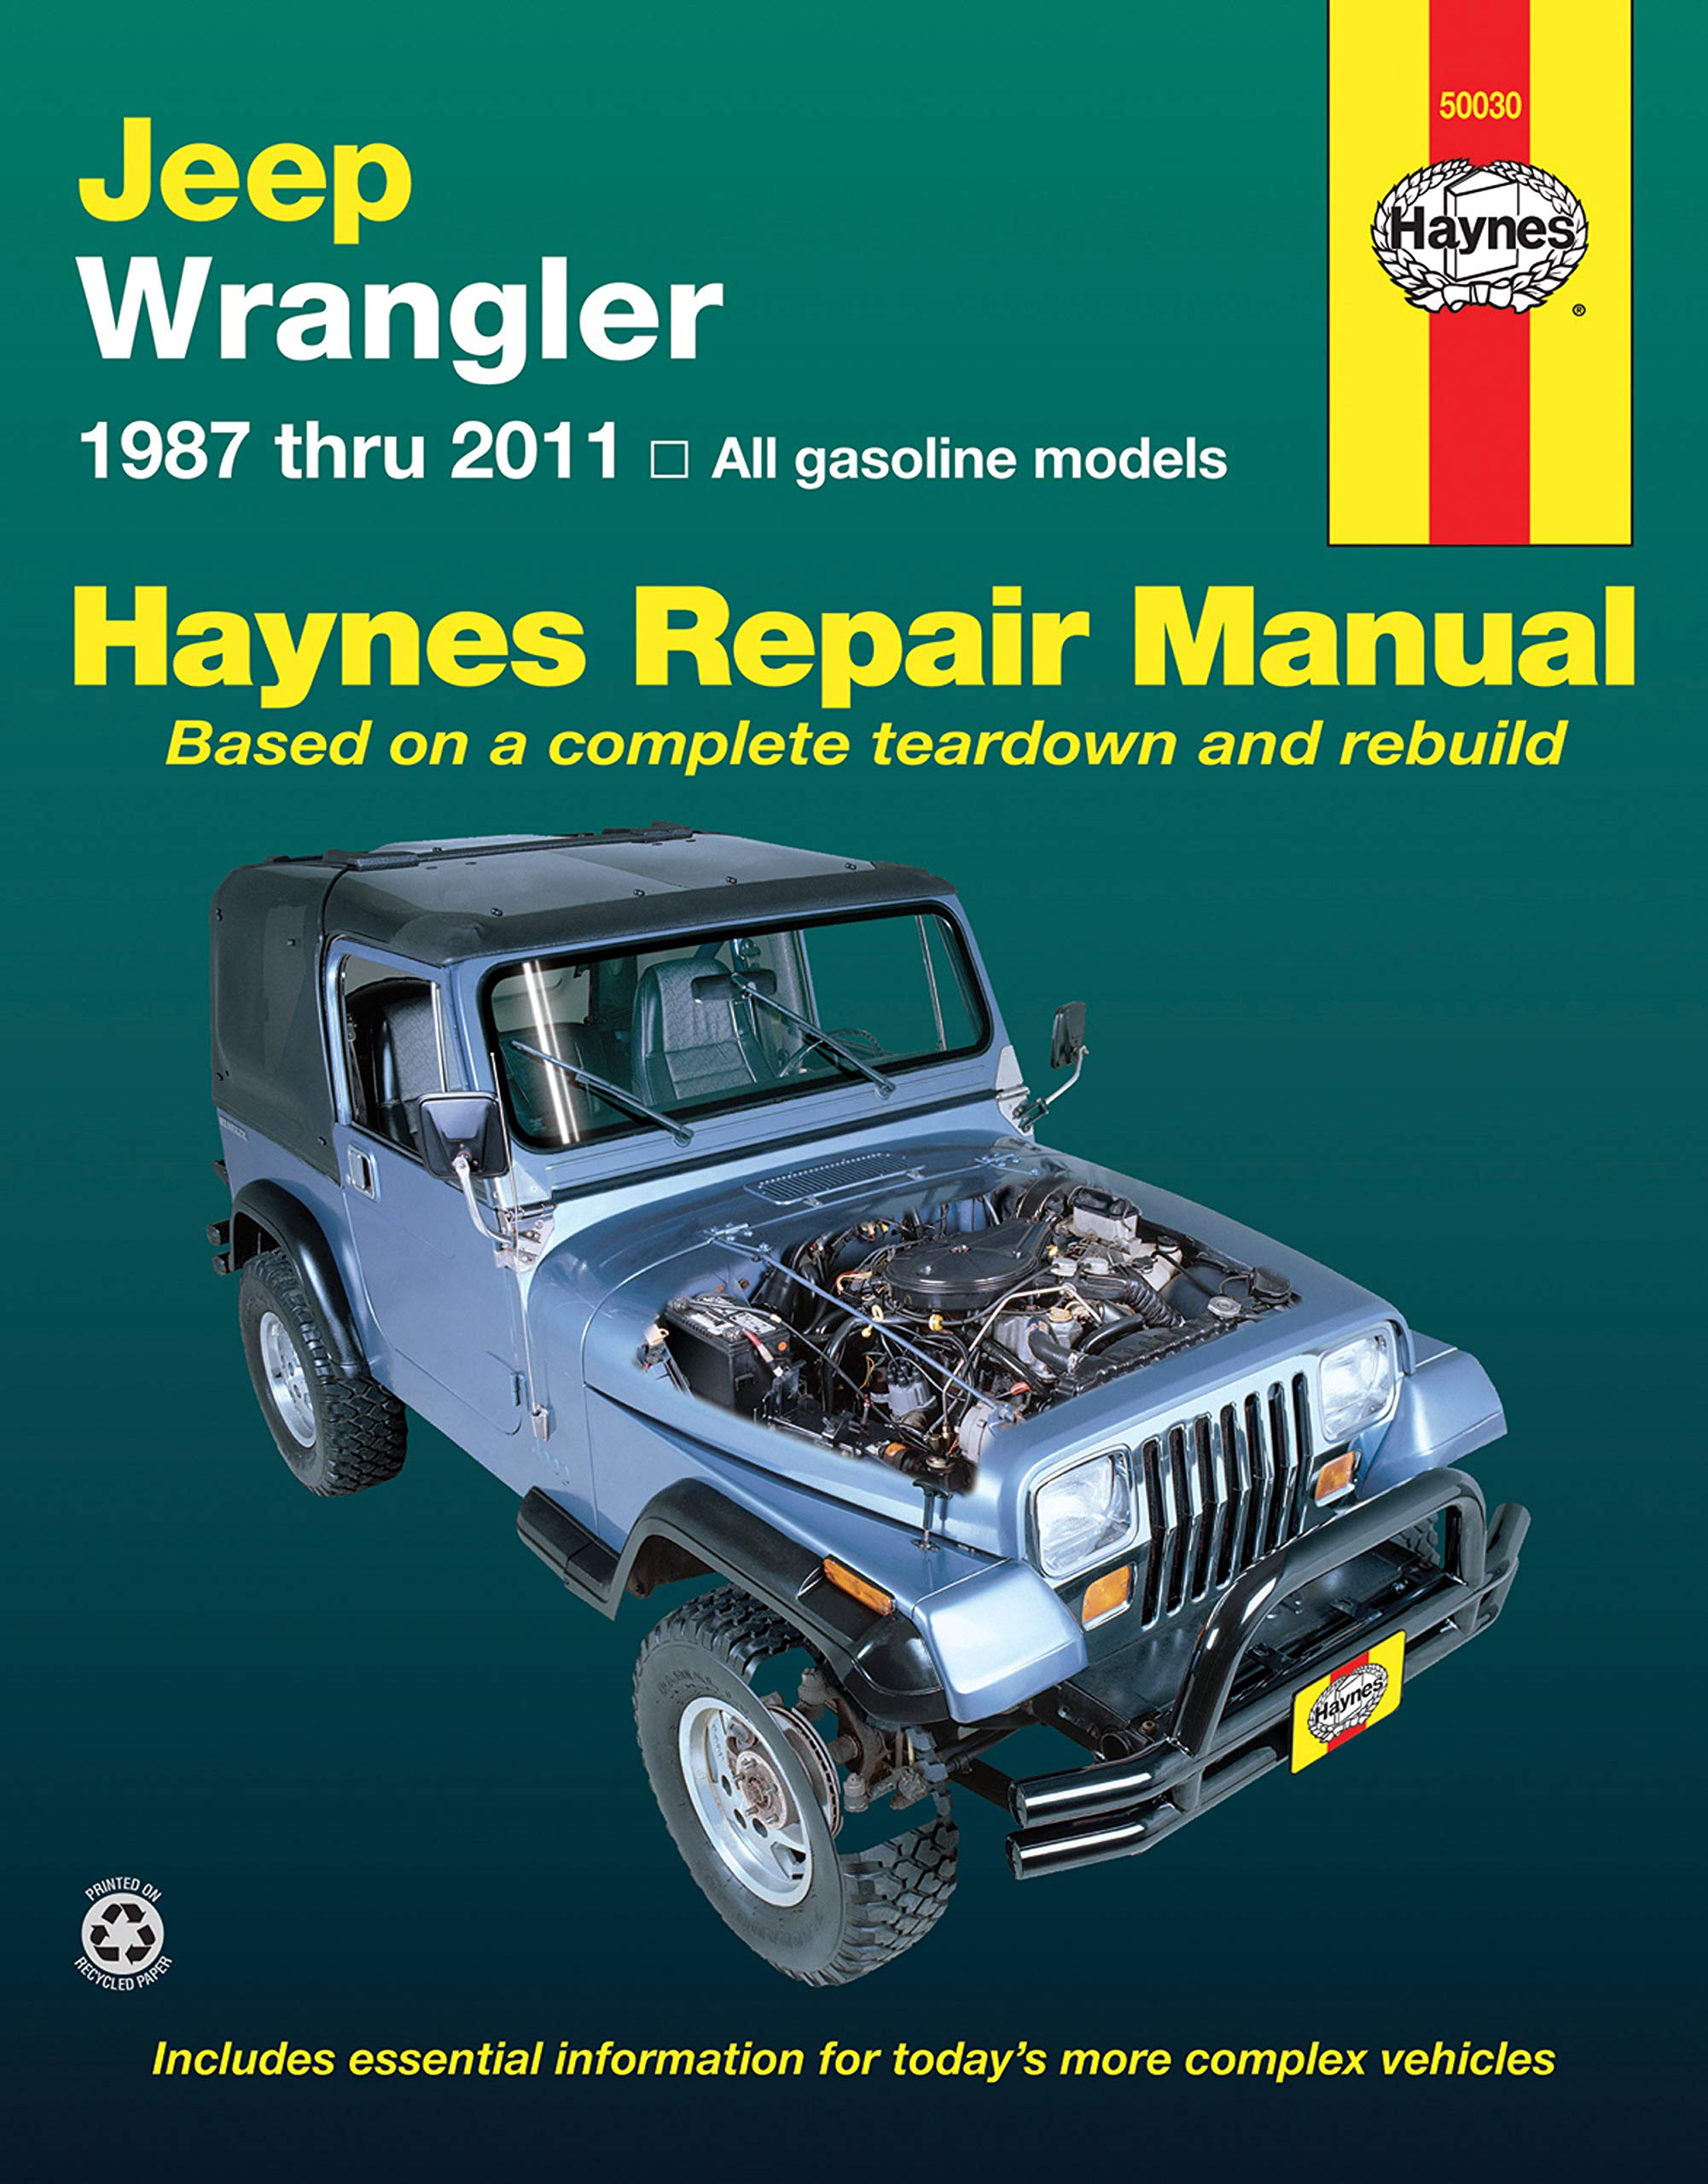 Haynes Jeep Wranglar 87 03 Manual 50030 Aa 0038345017773 2003 4 Liter Engine Diagram Books